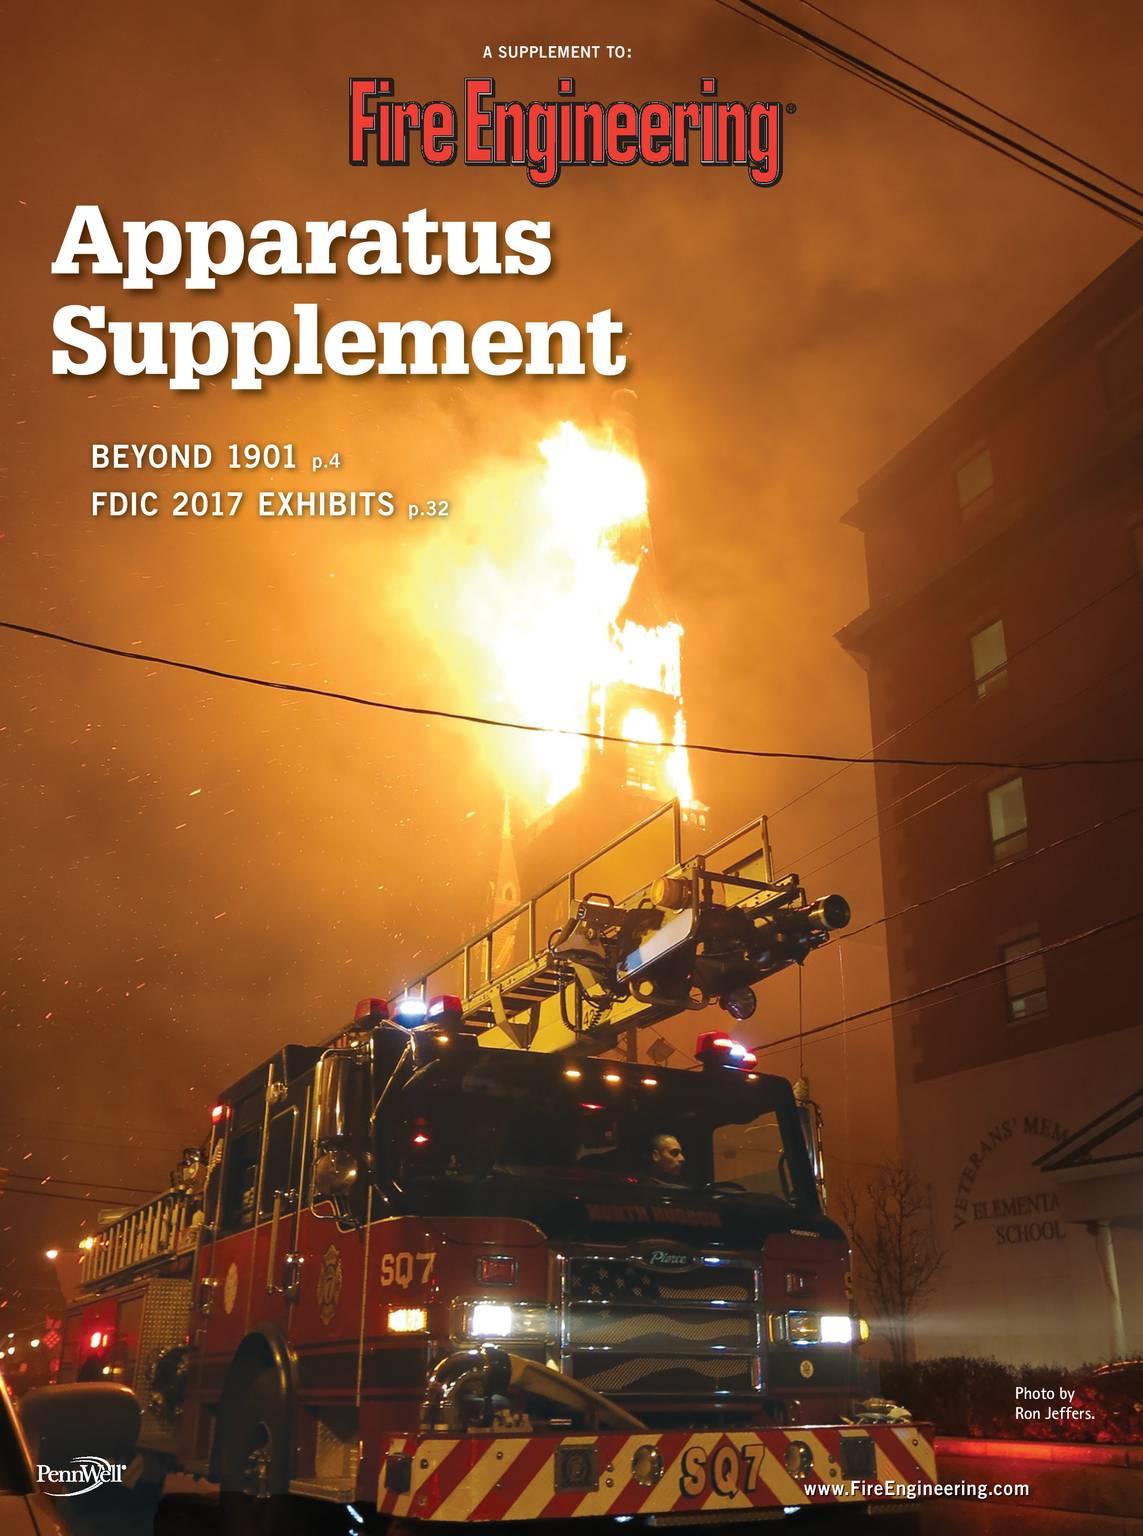 Pennwell Supplements - FE June 2017 Apparatus Supplement